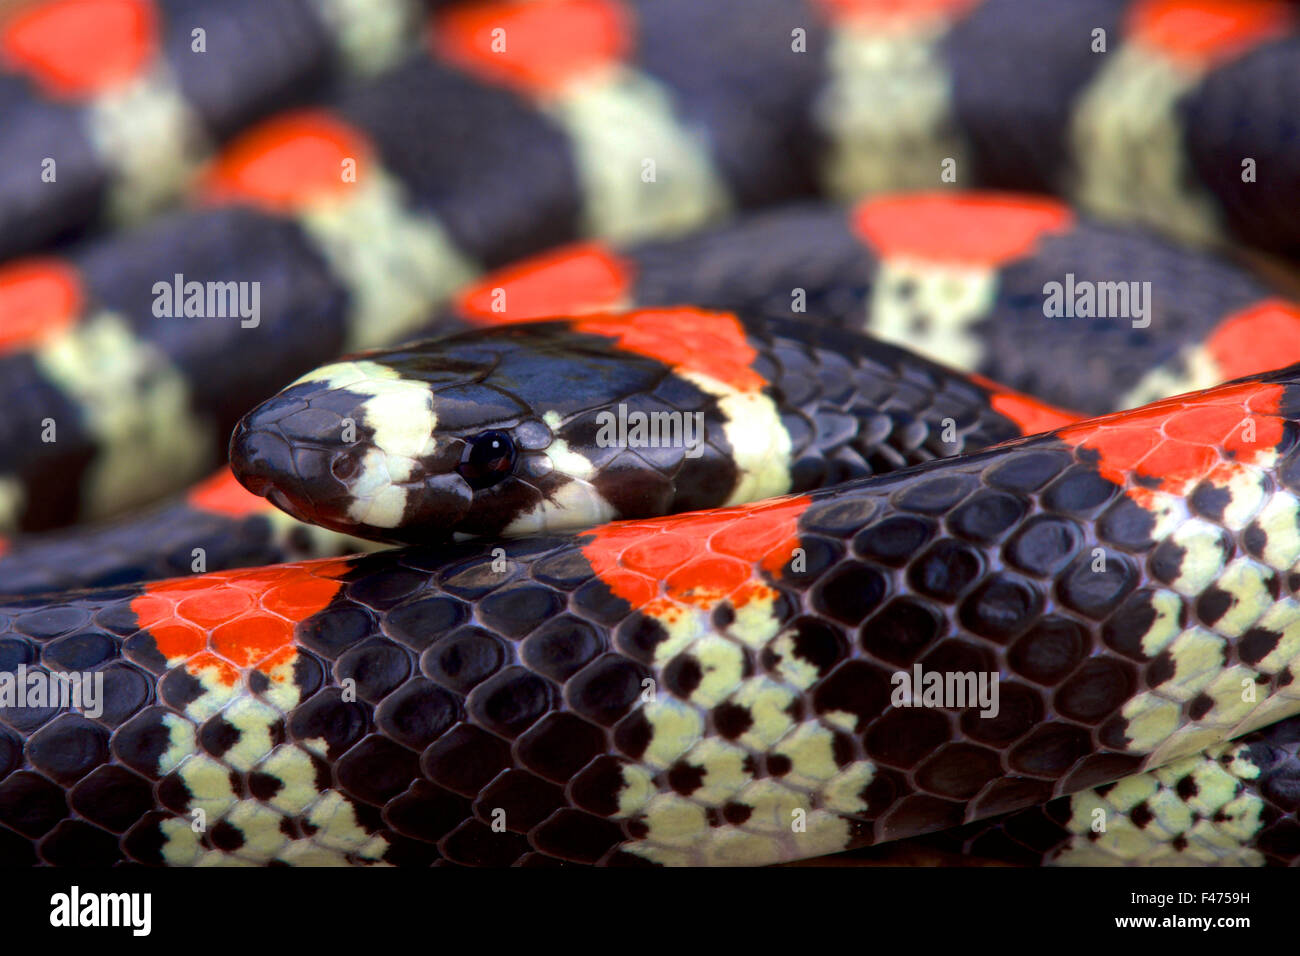 Bandas negras (Serpiente Comer ciempiés Scolecophis atrocinctus) Imagen De Stock